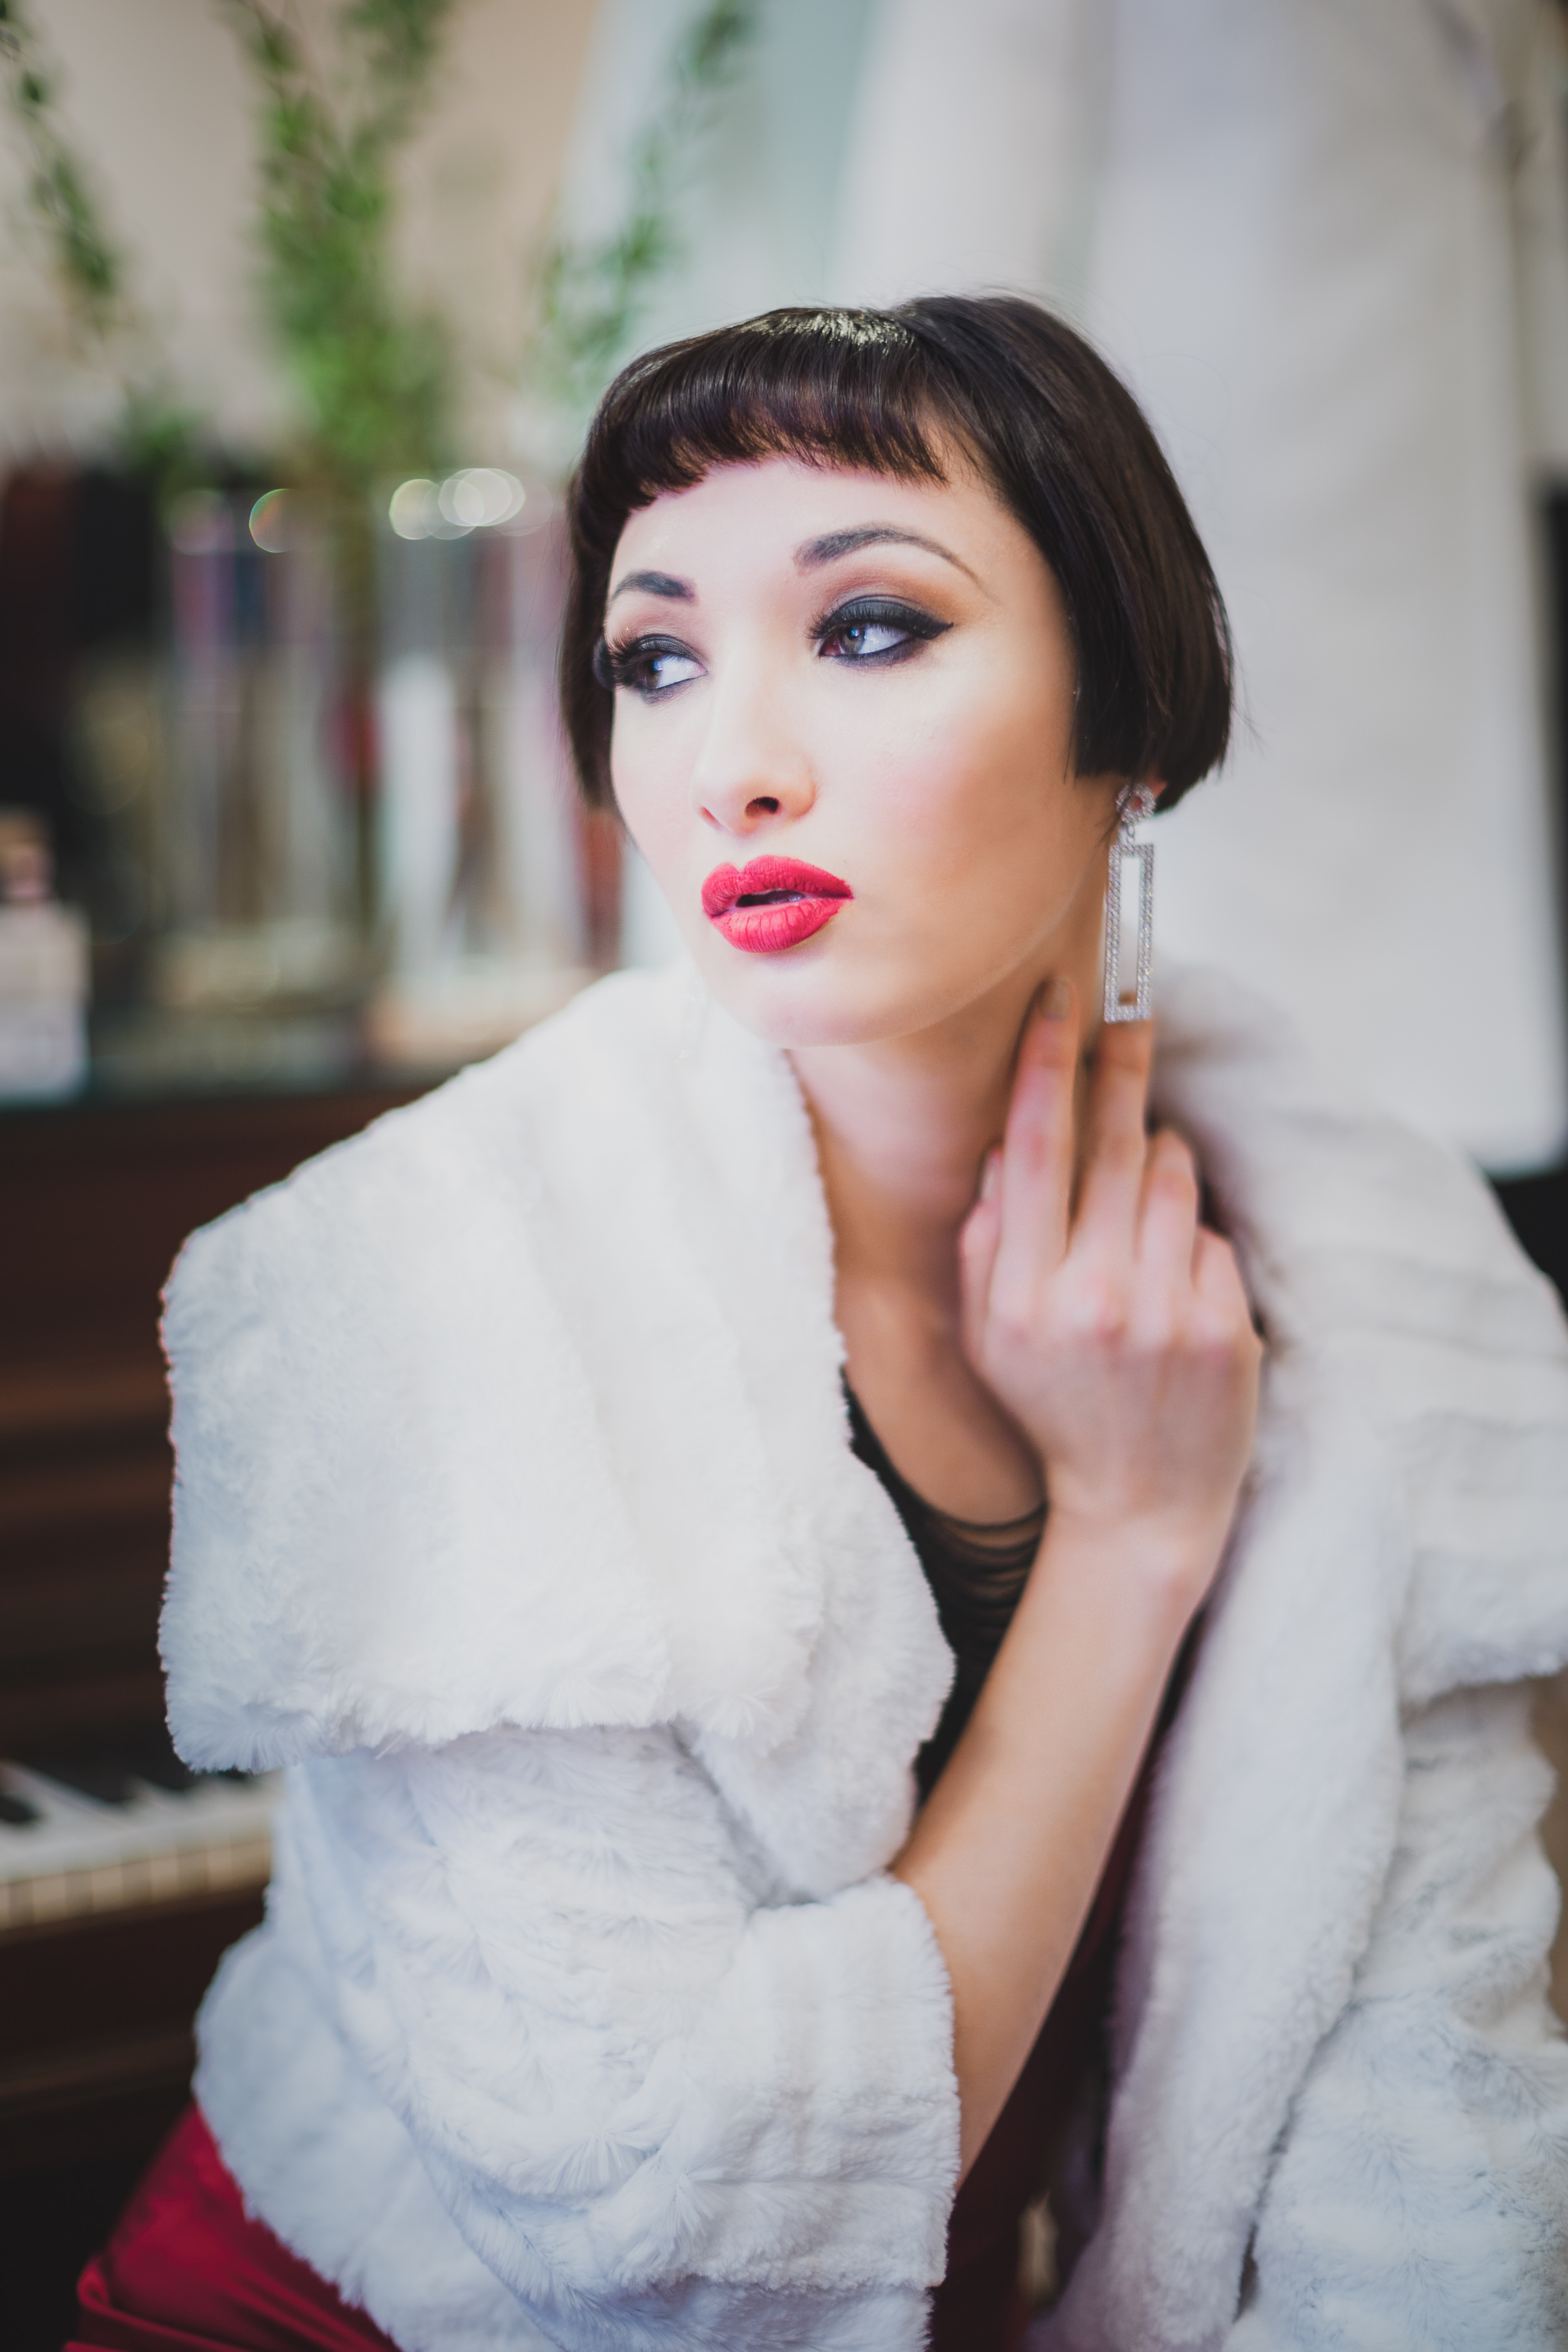 Anya_Ponorovskaya-02.jpg